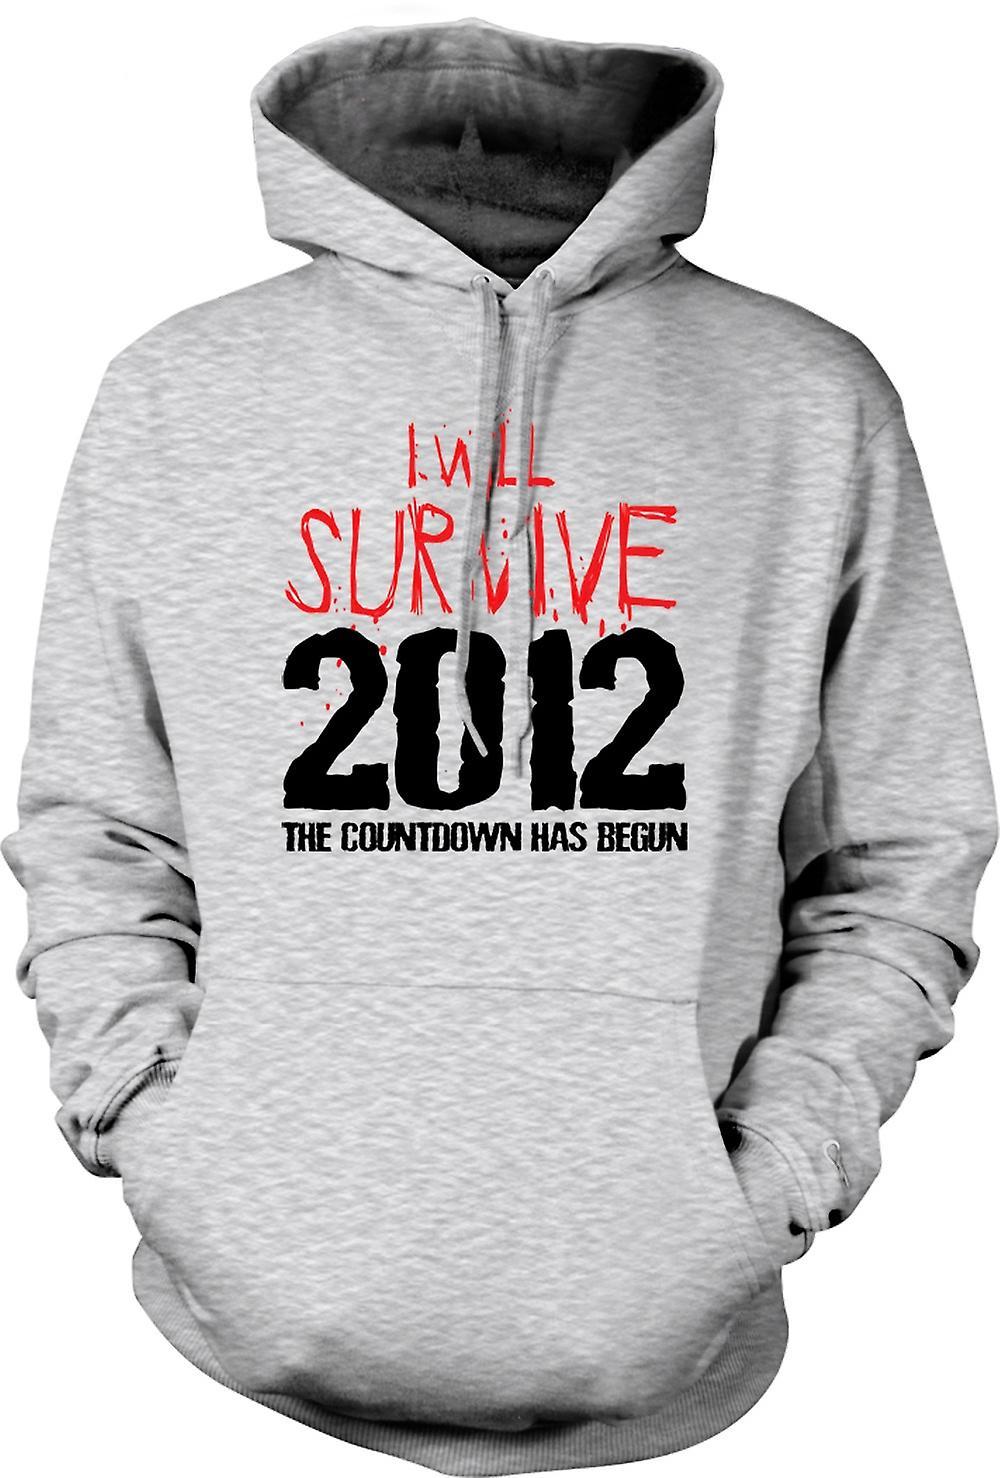 Mens Hoodie - 2012 I Will Survive Apocalypse fin de la Première